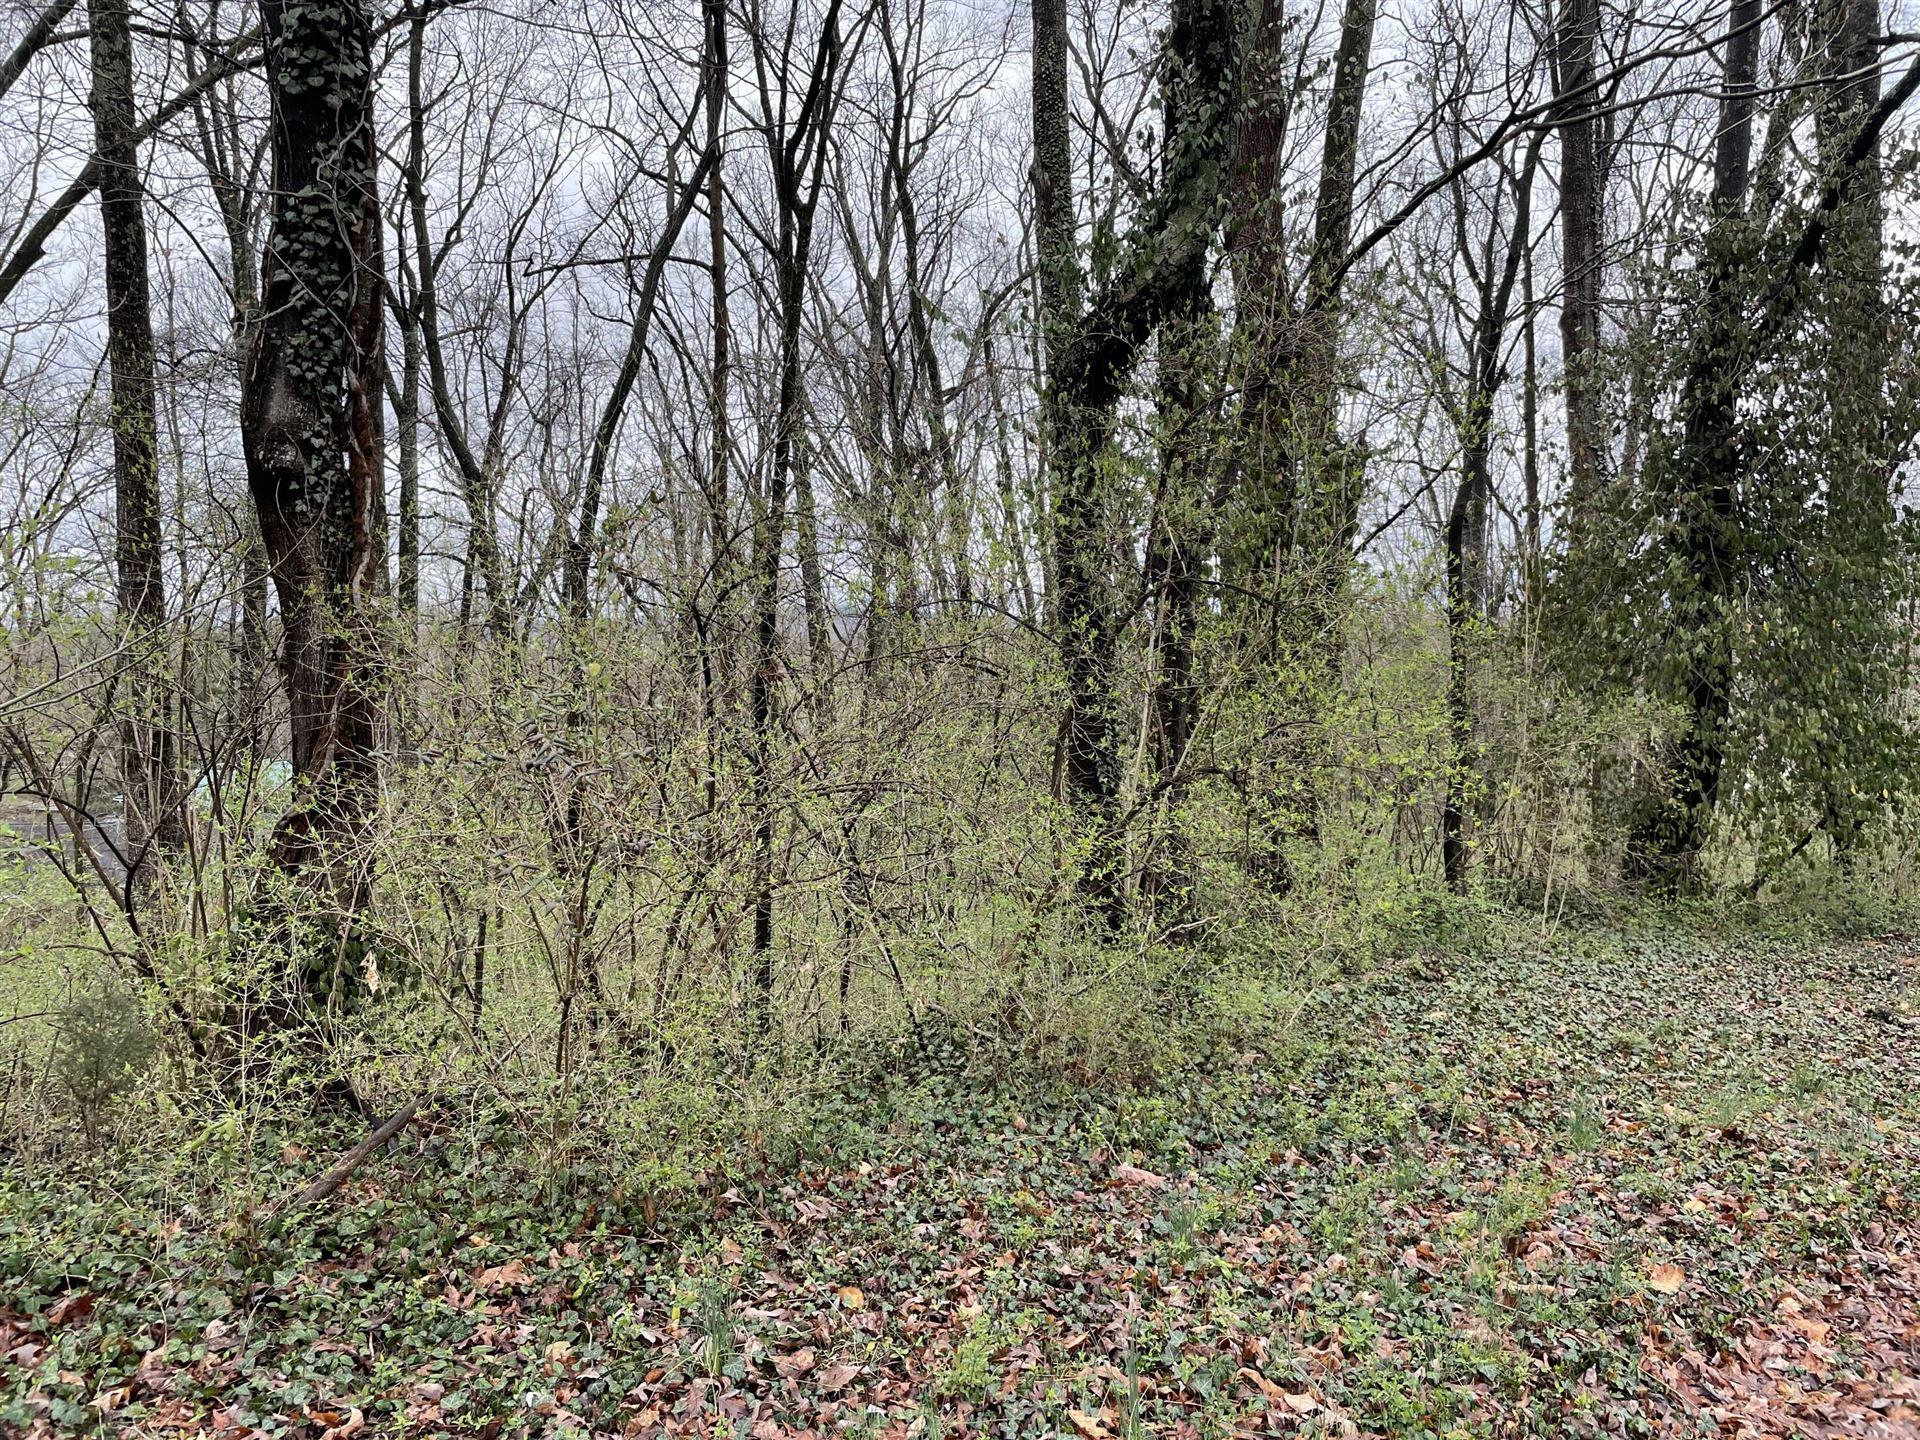 Photo of Lot 20 Hillside Road, Johnson City, TN 37601 (MLS # 9919980)